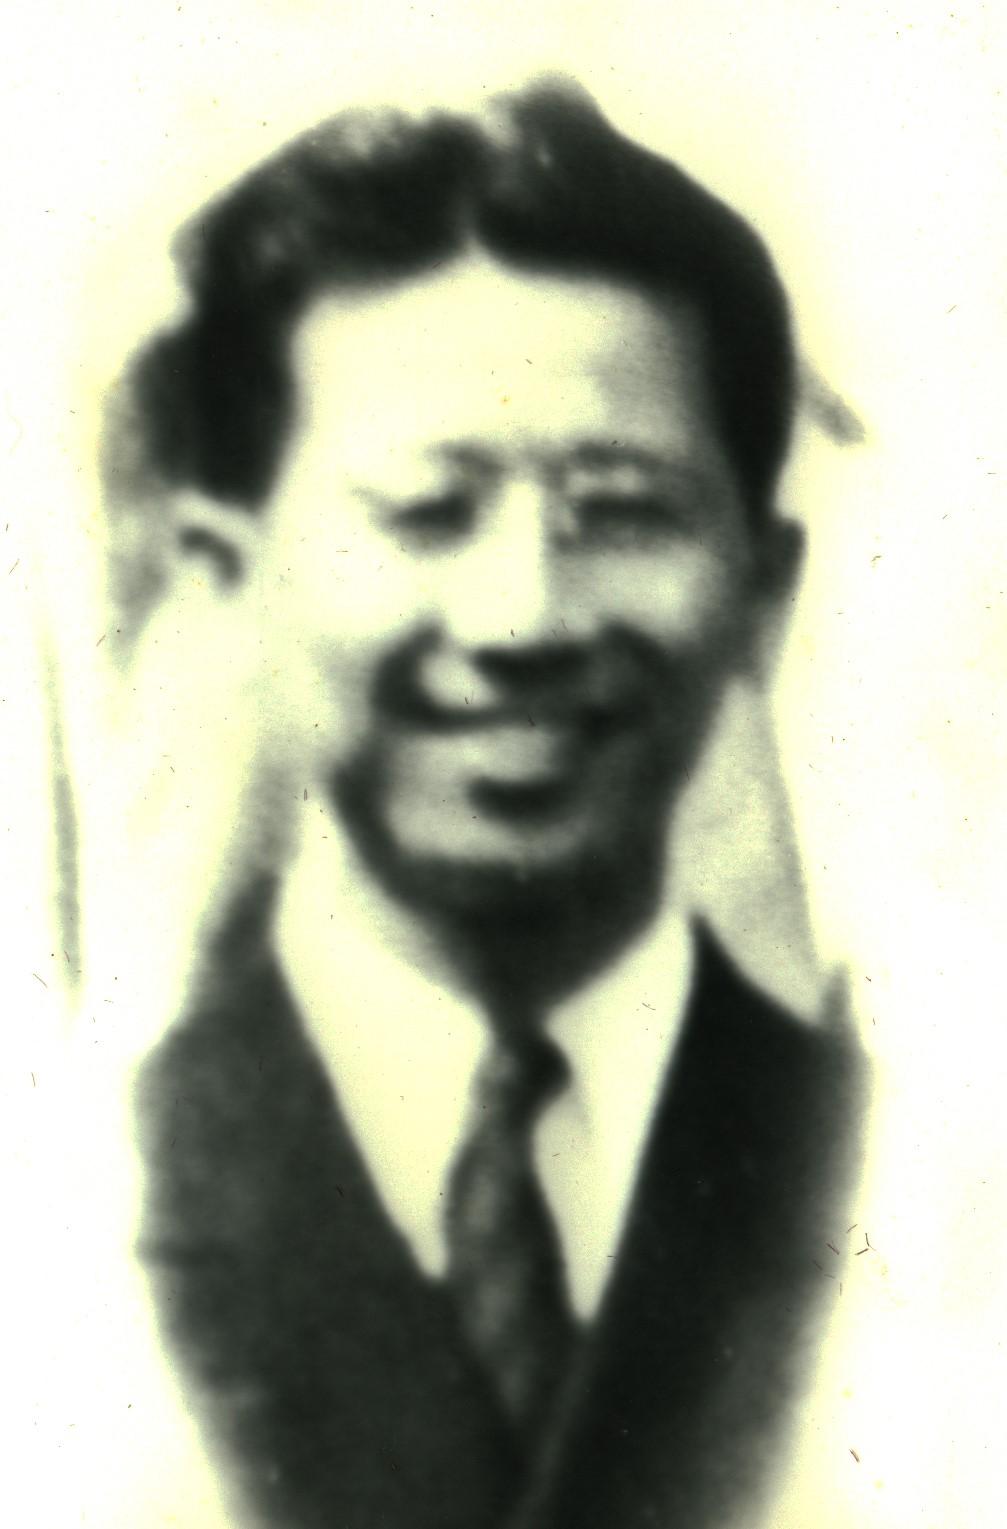 Robert Shimoda 1944-1949